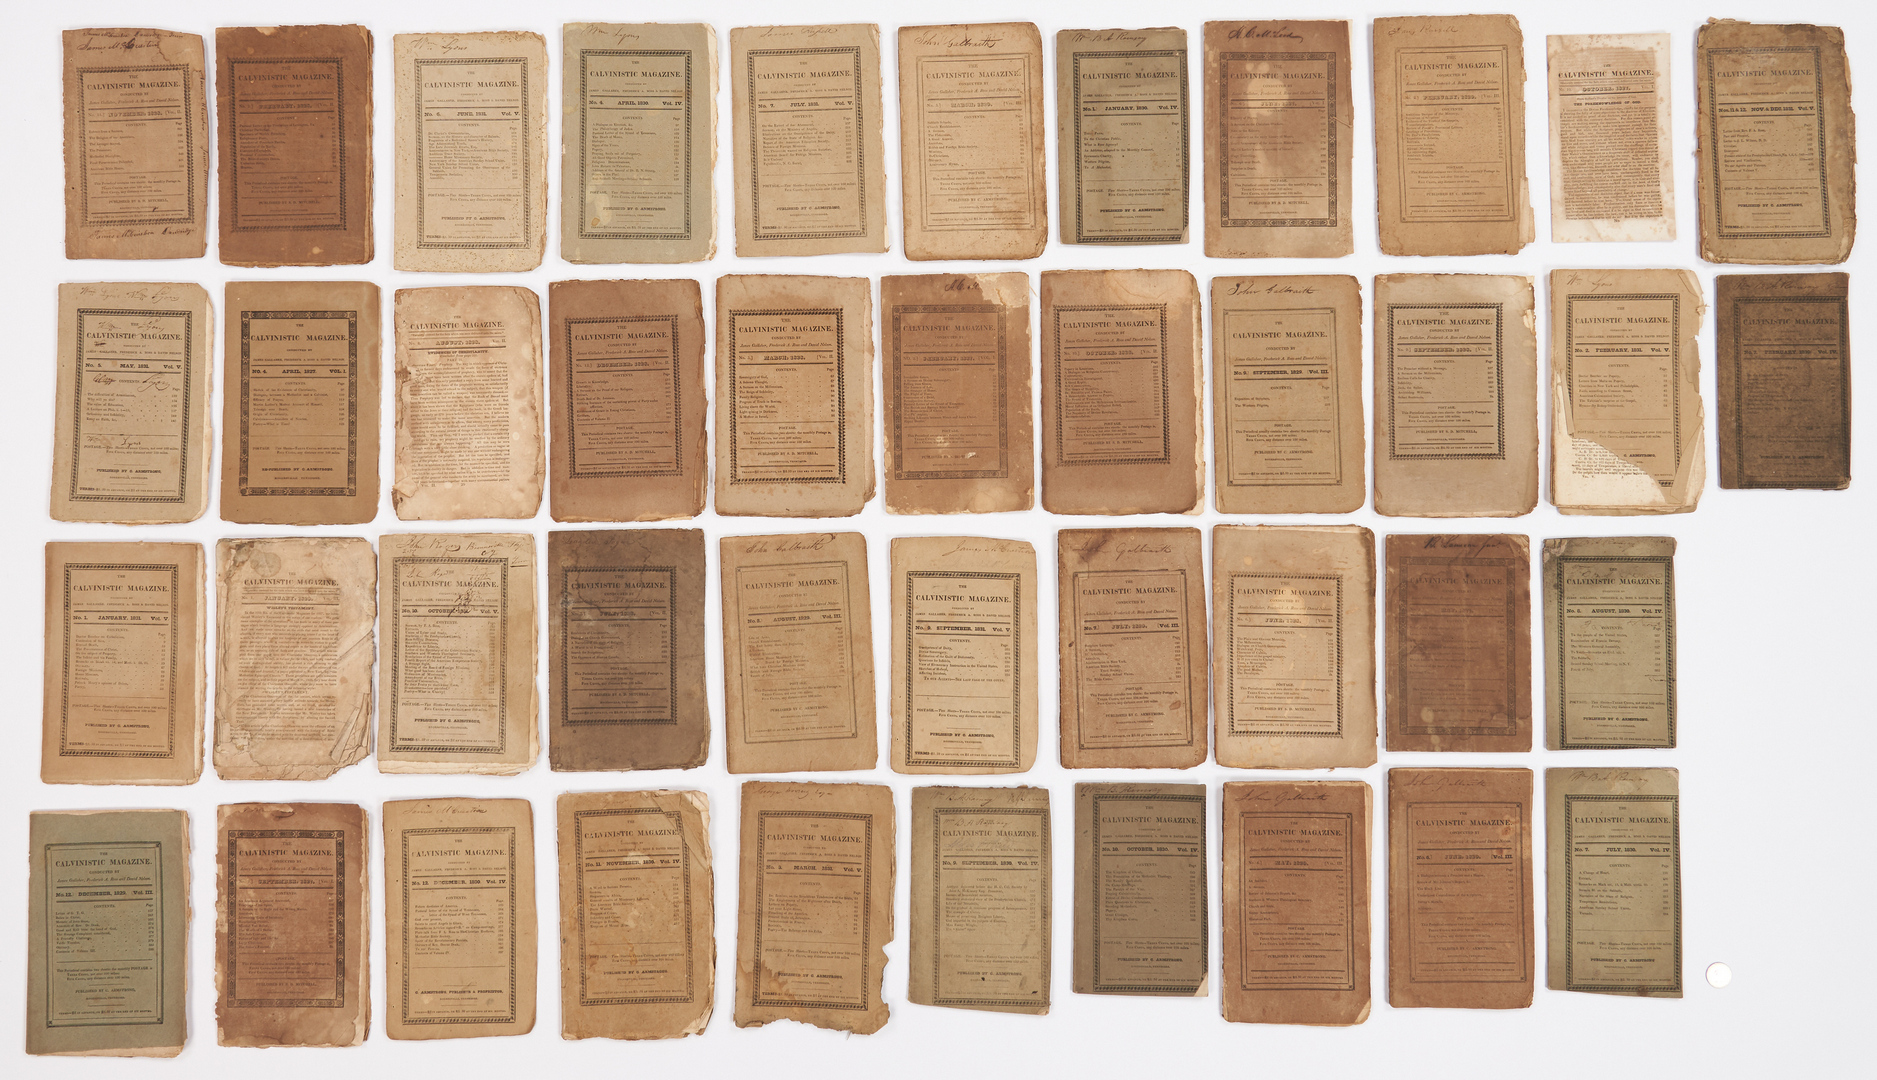 Lot 1030: 42 Calvinistic Magazines, Rogersville, TN, circa 1827-31